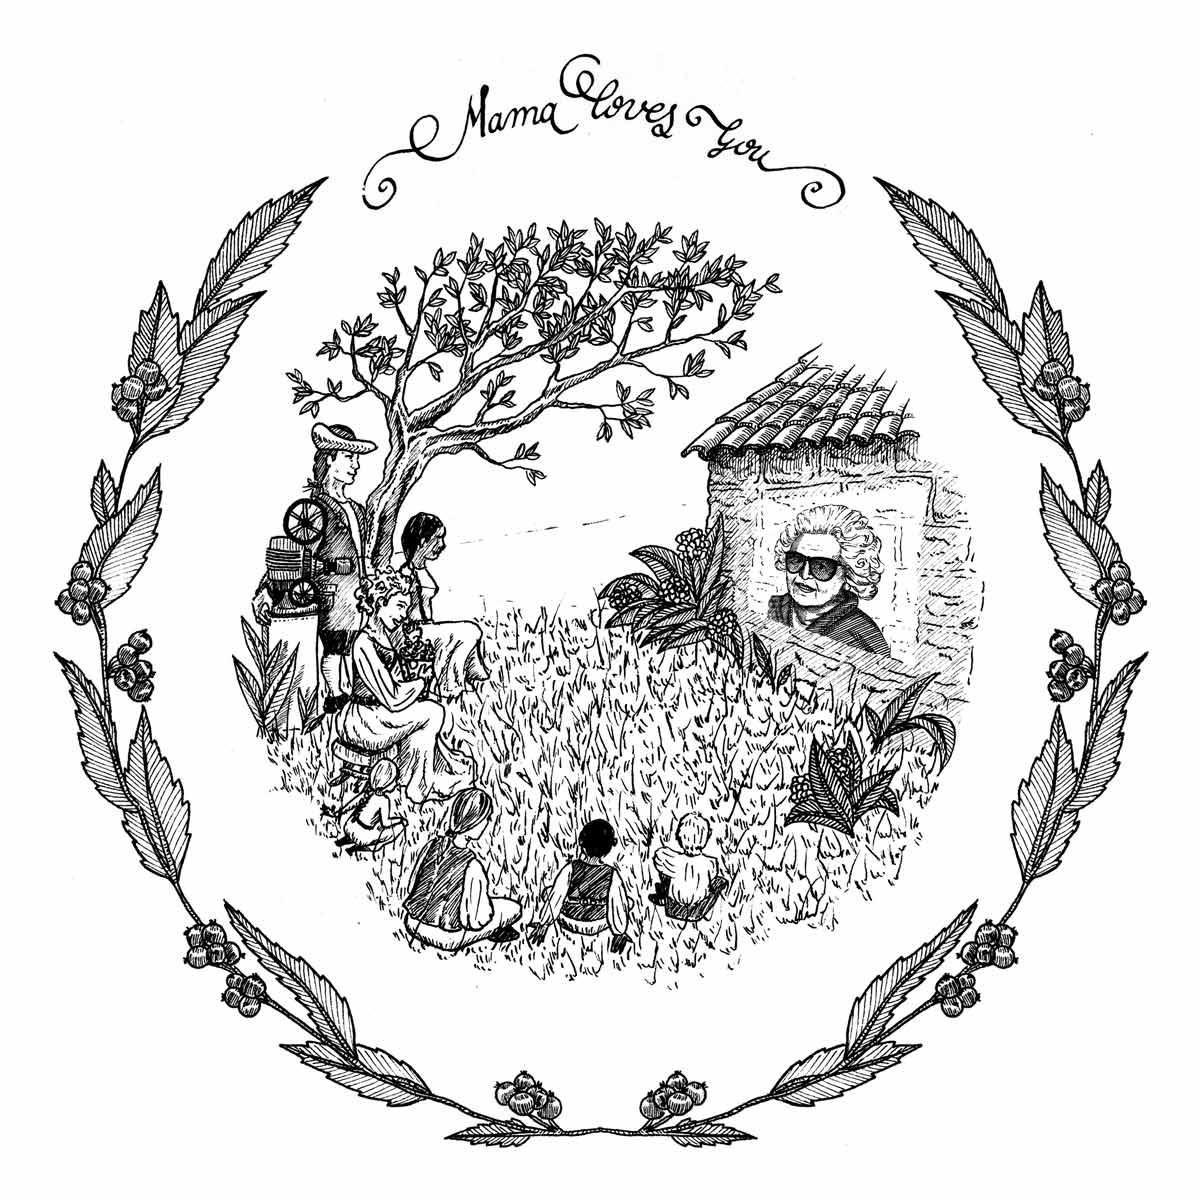 Juliette Seban – Mama Shelter – Assiette cinéma